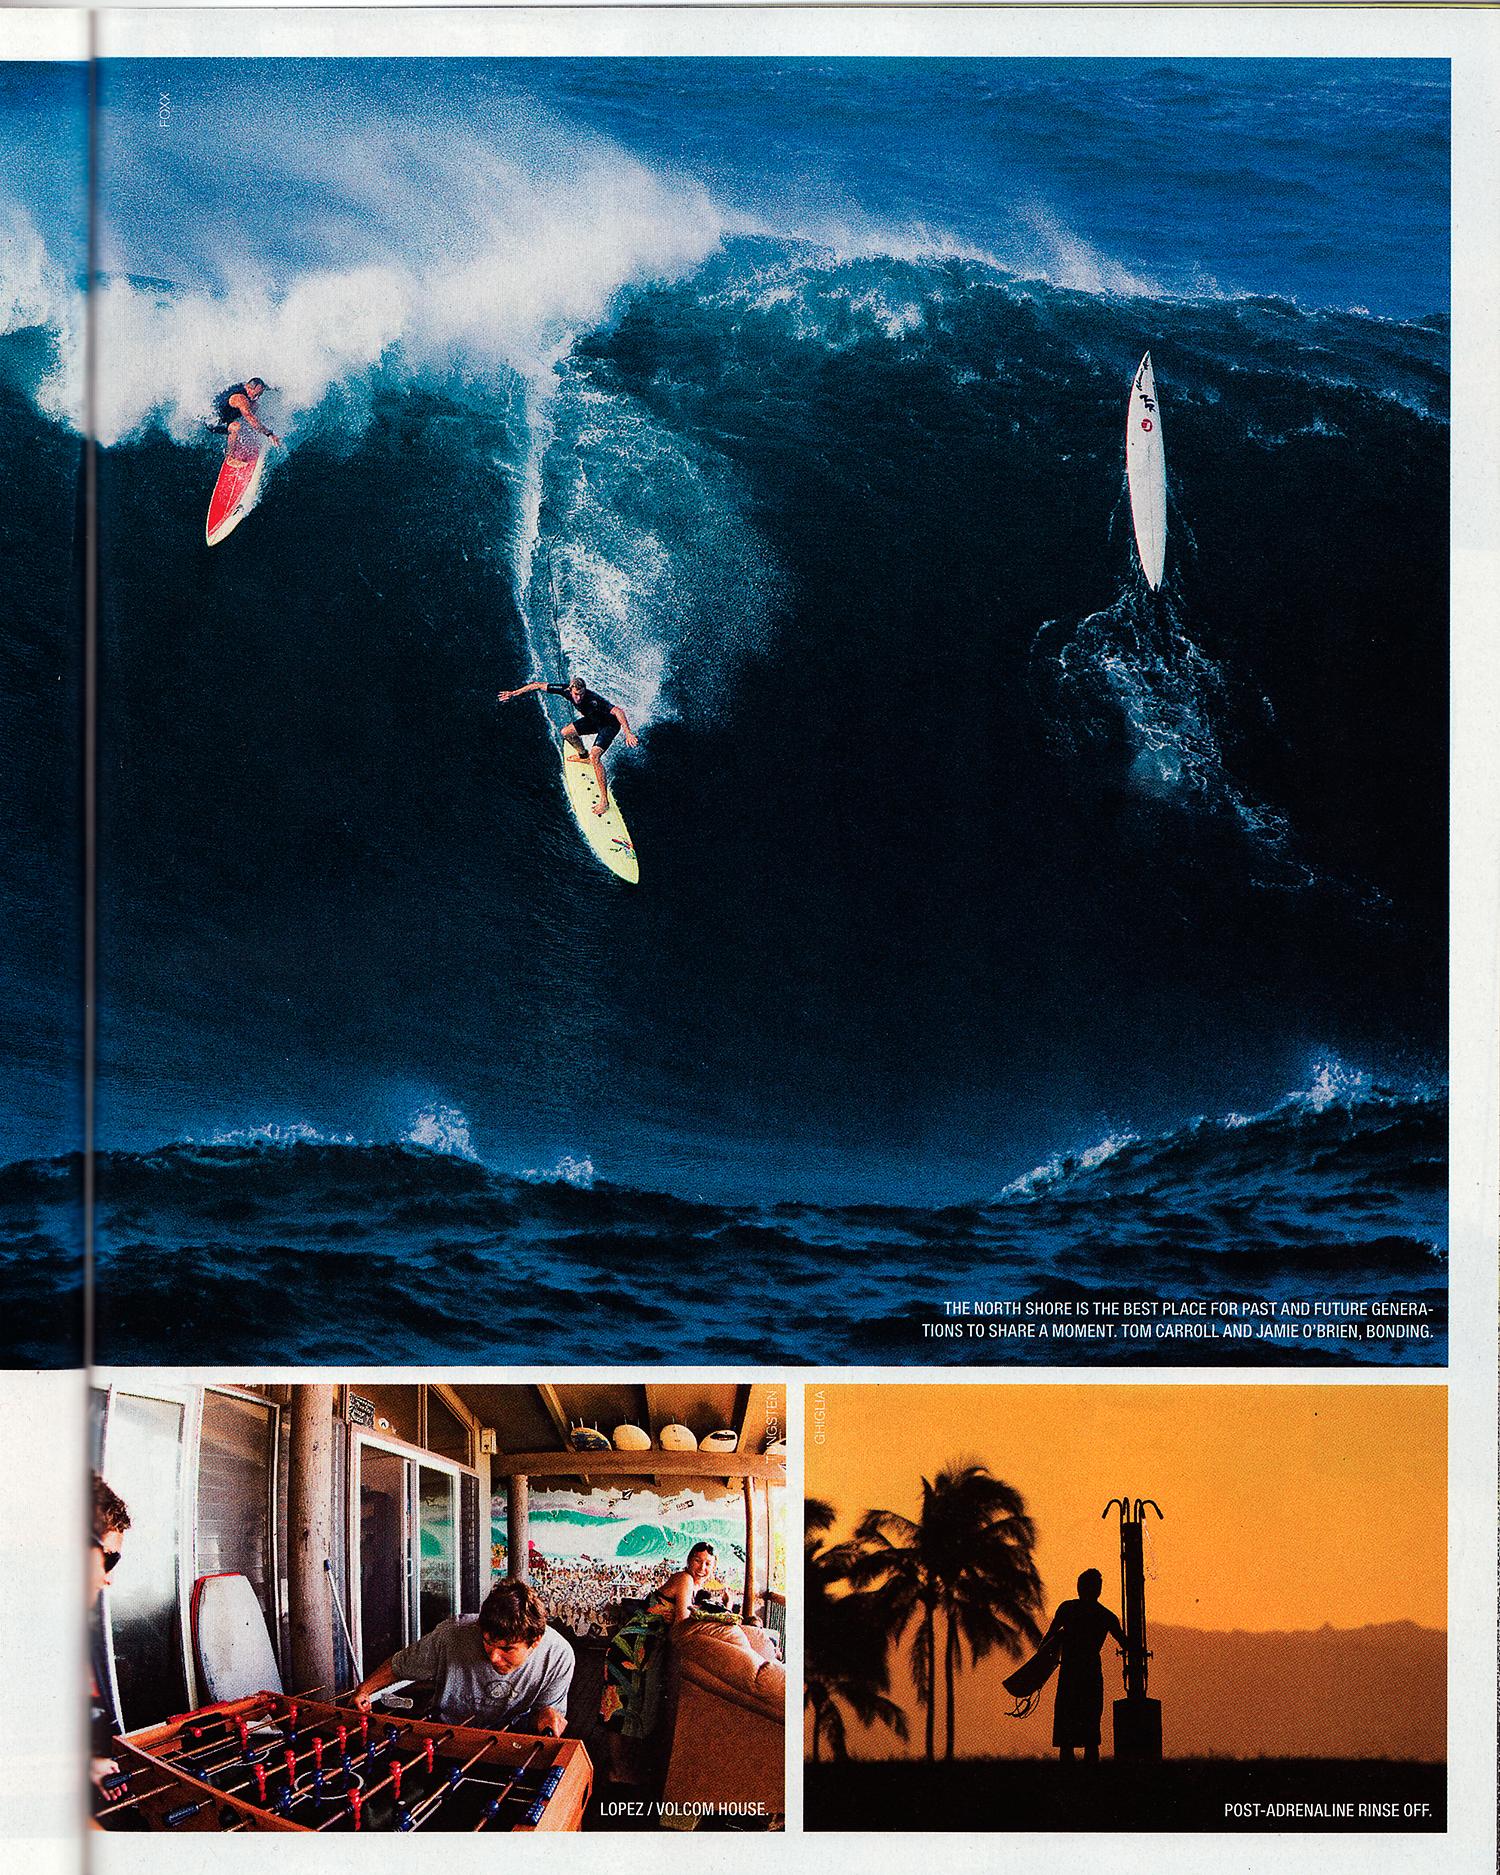 2008-04_Surfer-Inhalt05_A4-300dpi.jpg